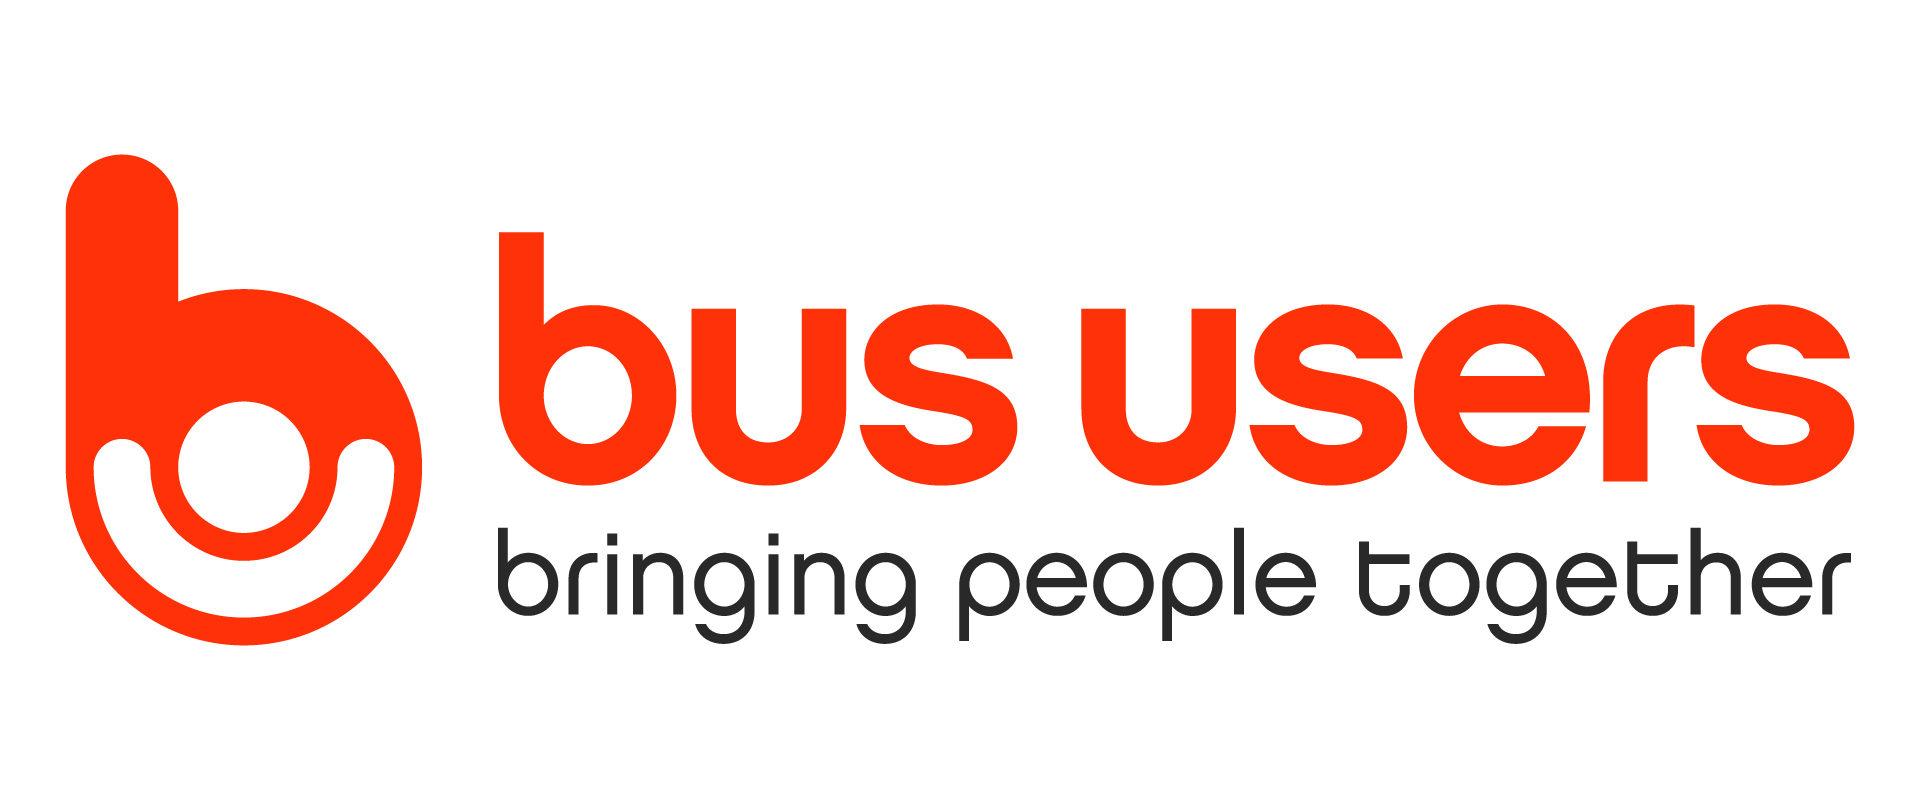 Bus Users logo